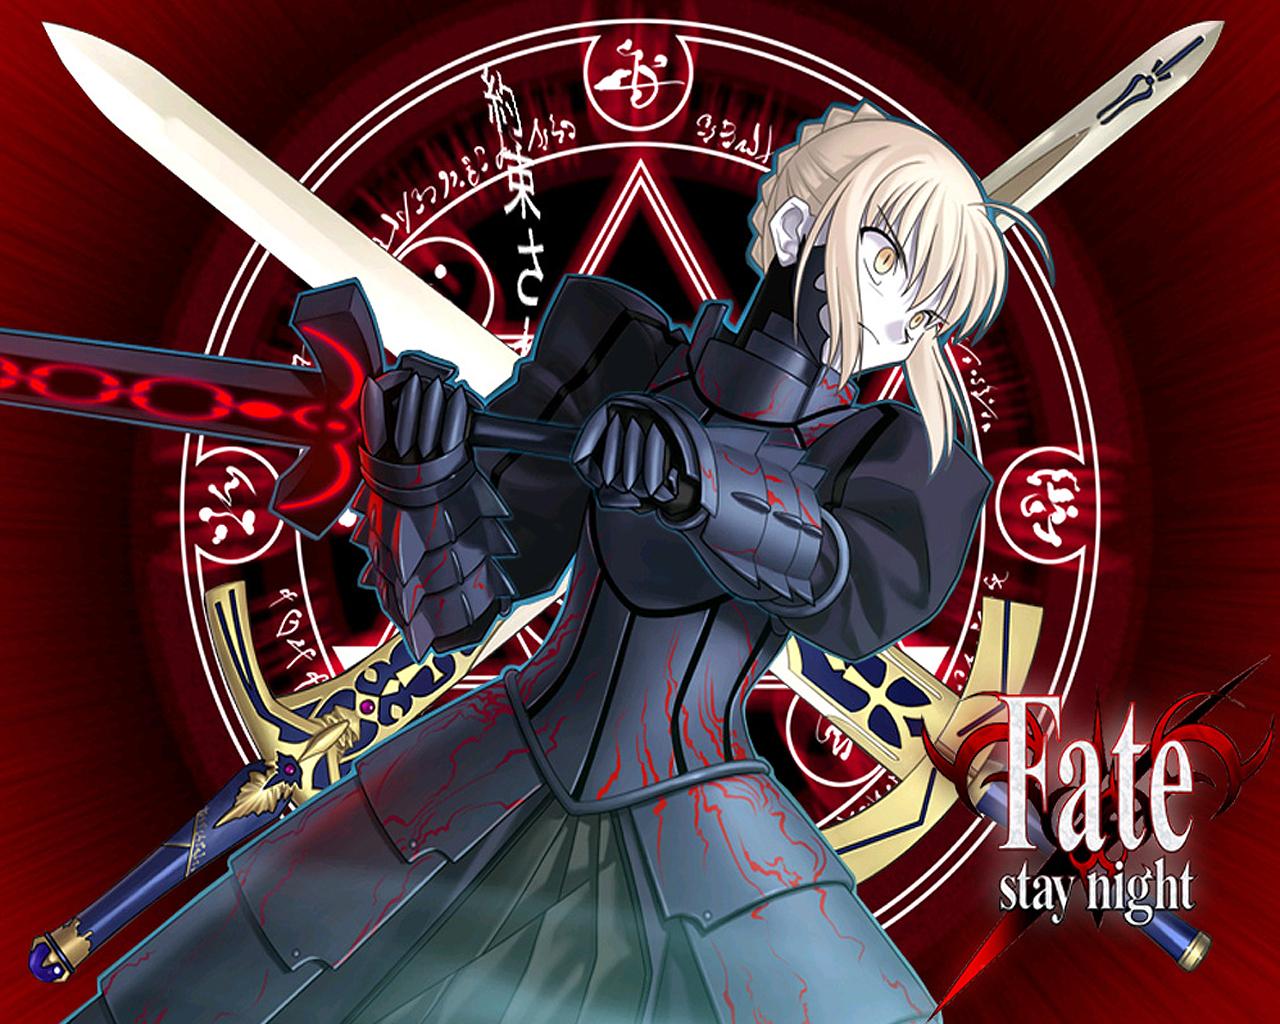 Fate/stay night Wallpaper: Evil Saber - Minitokyo